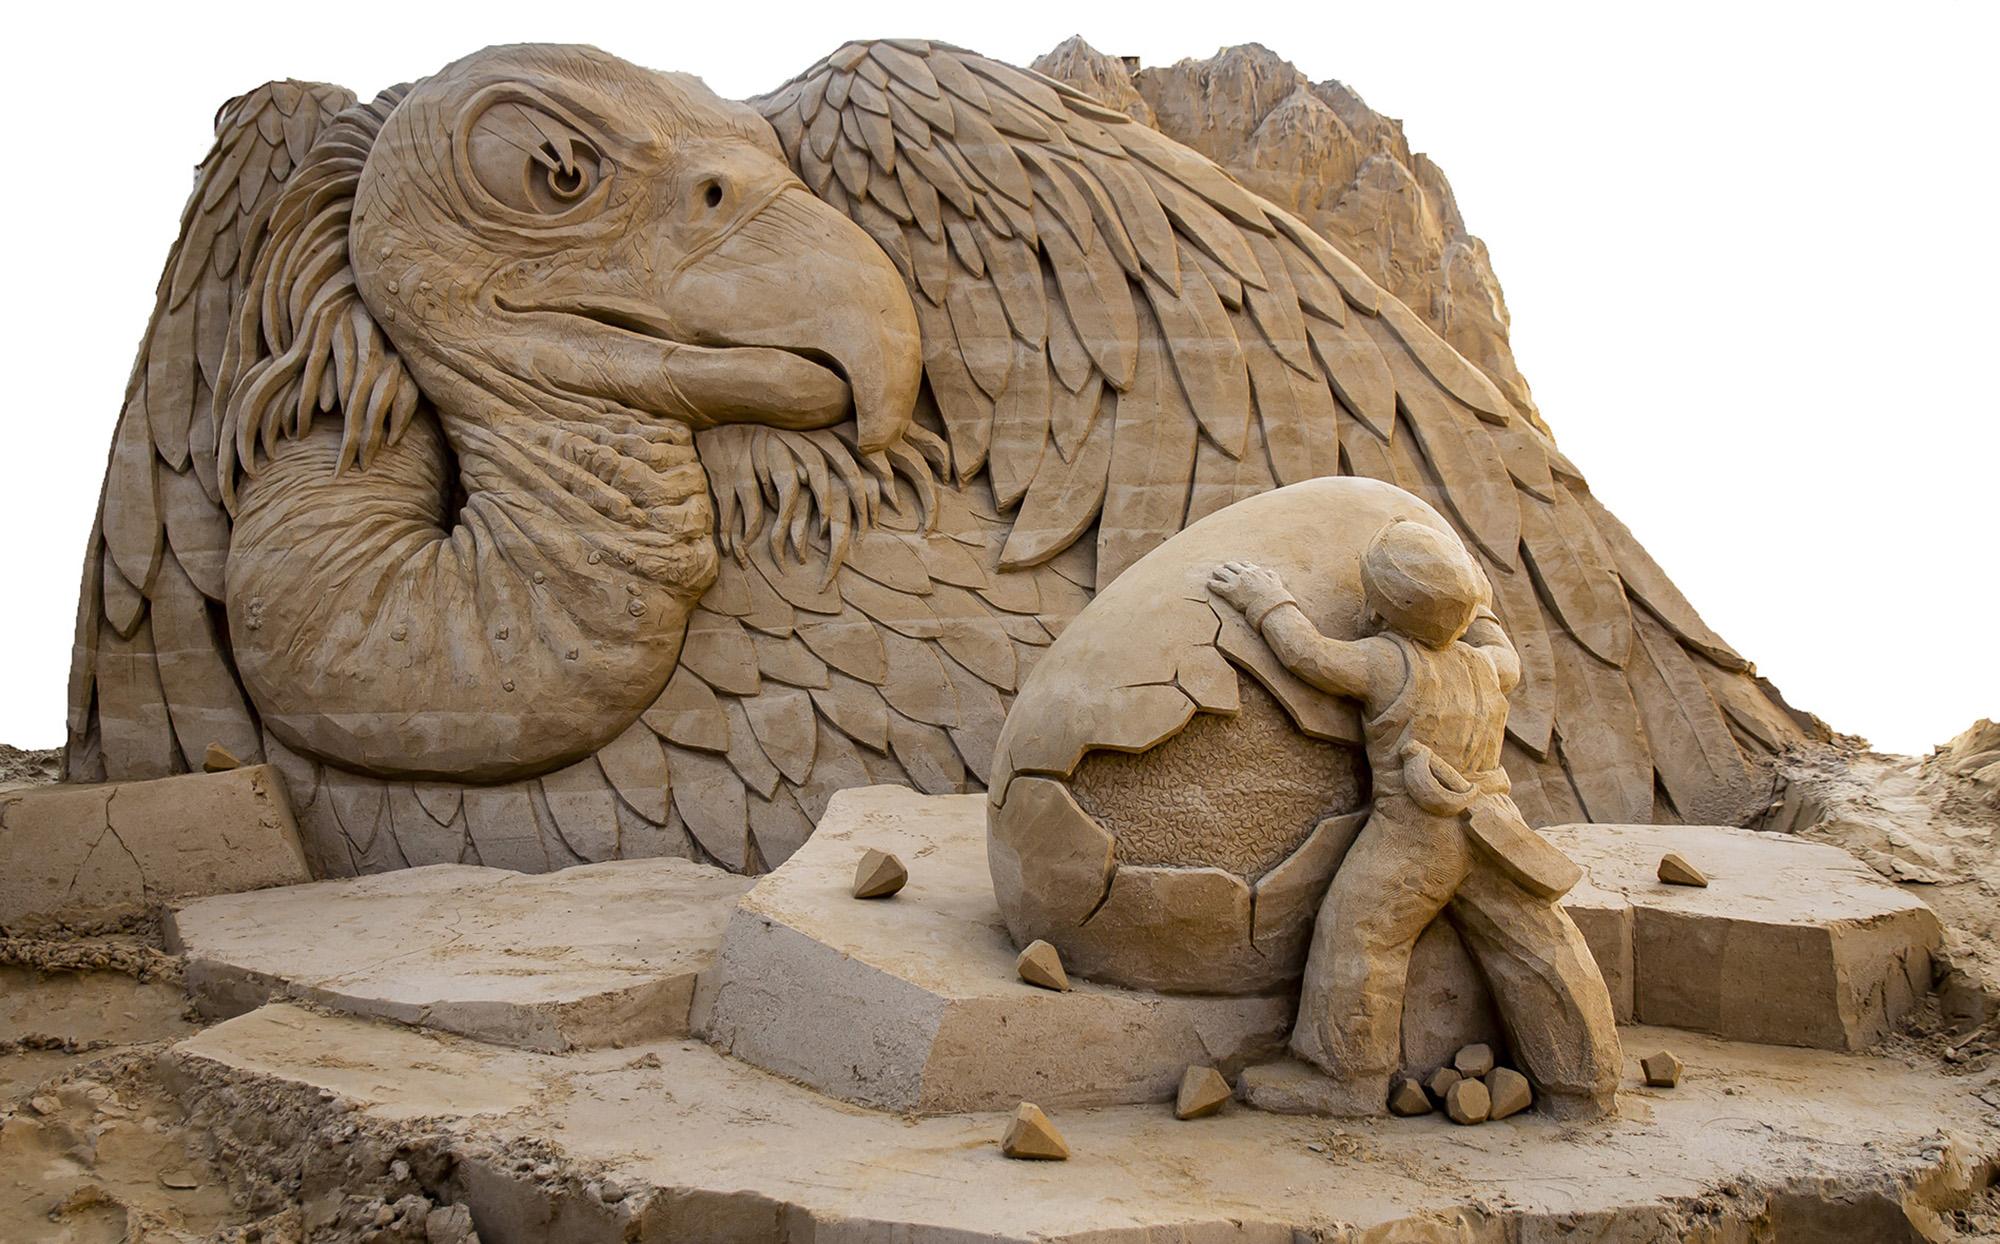 Sandtastic Beasts: Sand Sculpture Masterpieces In Wildlife Exhibition